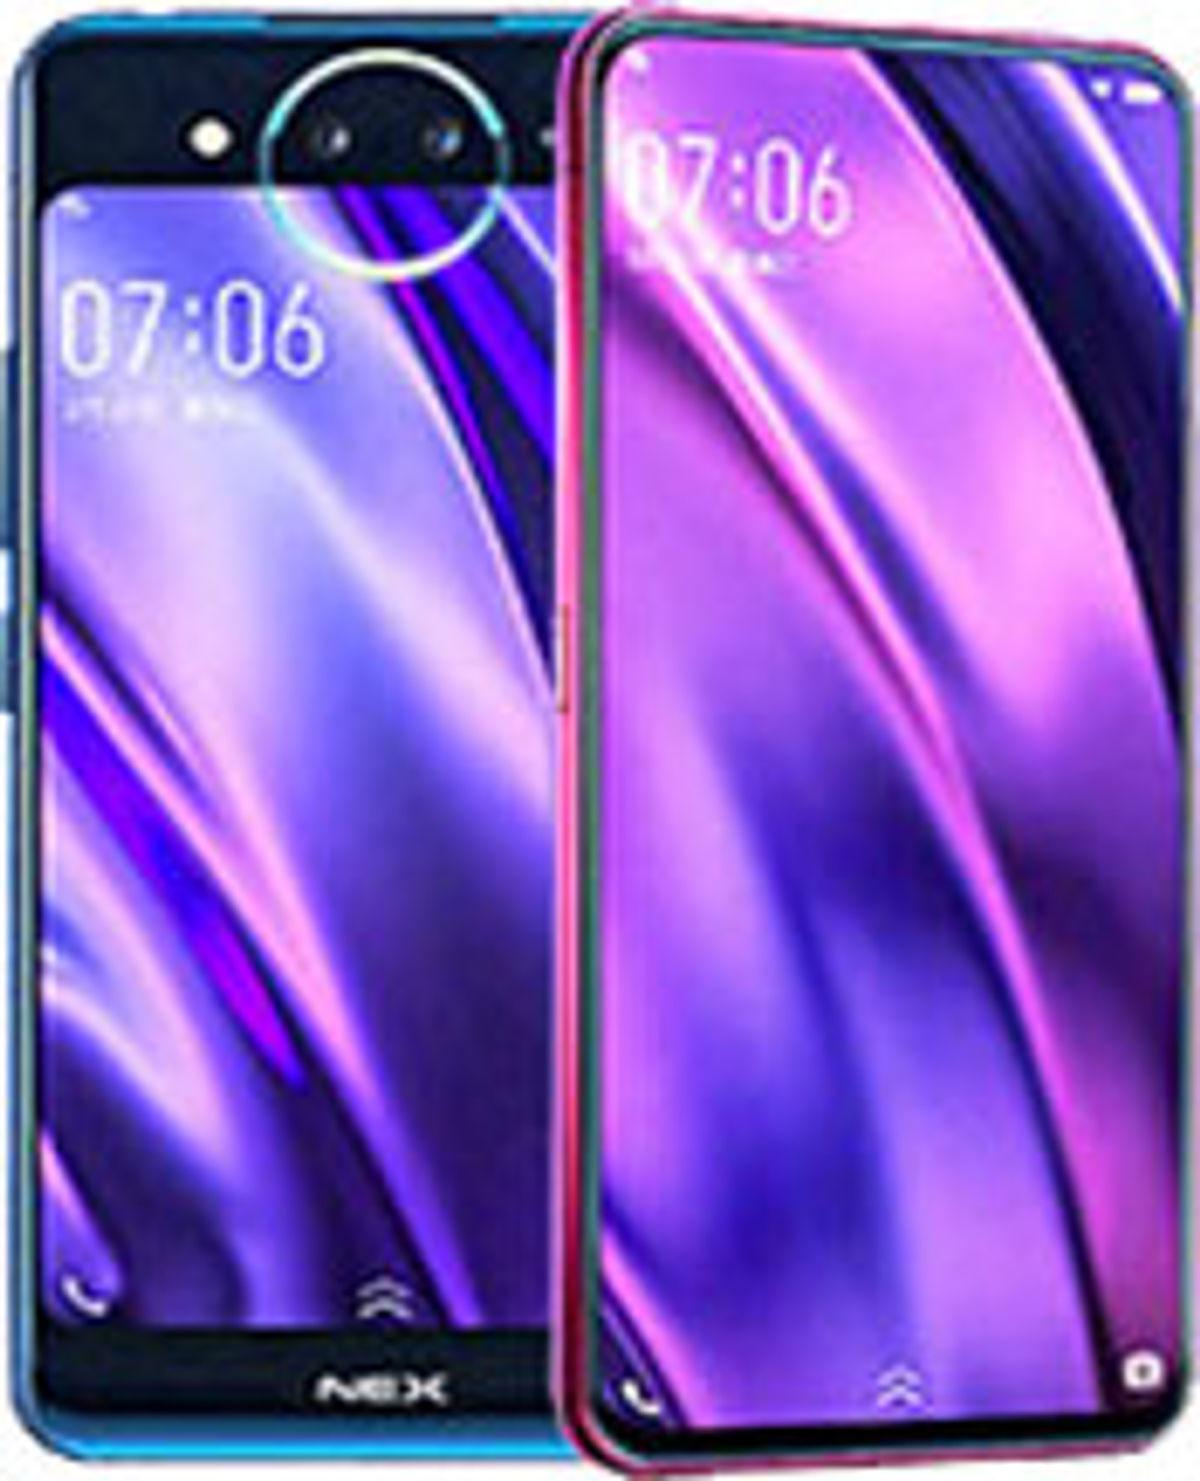 Best 10 GB RAM Mobiles Phones in India - September 2019